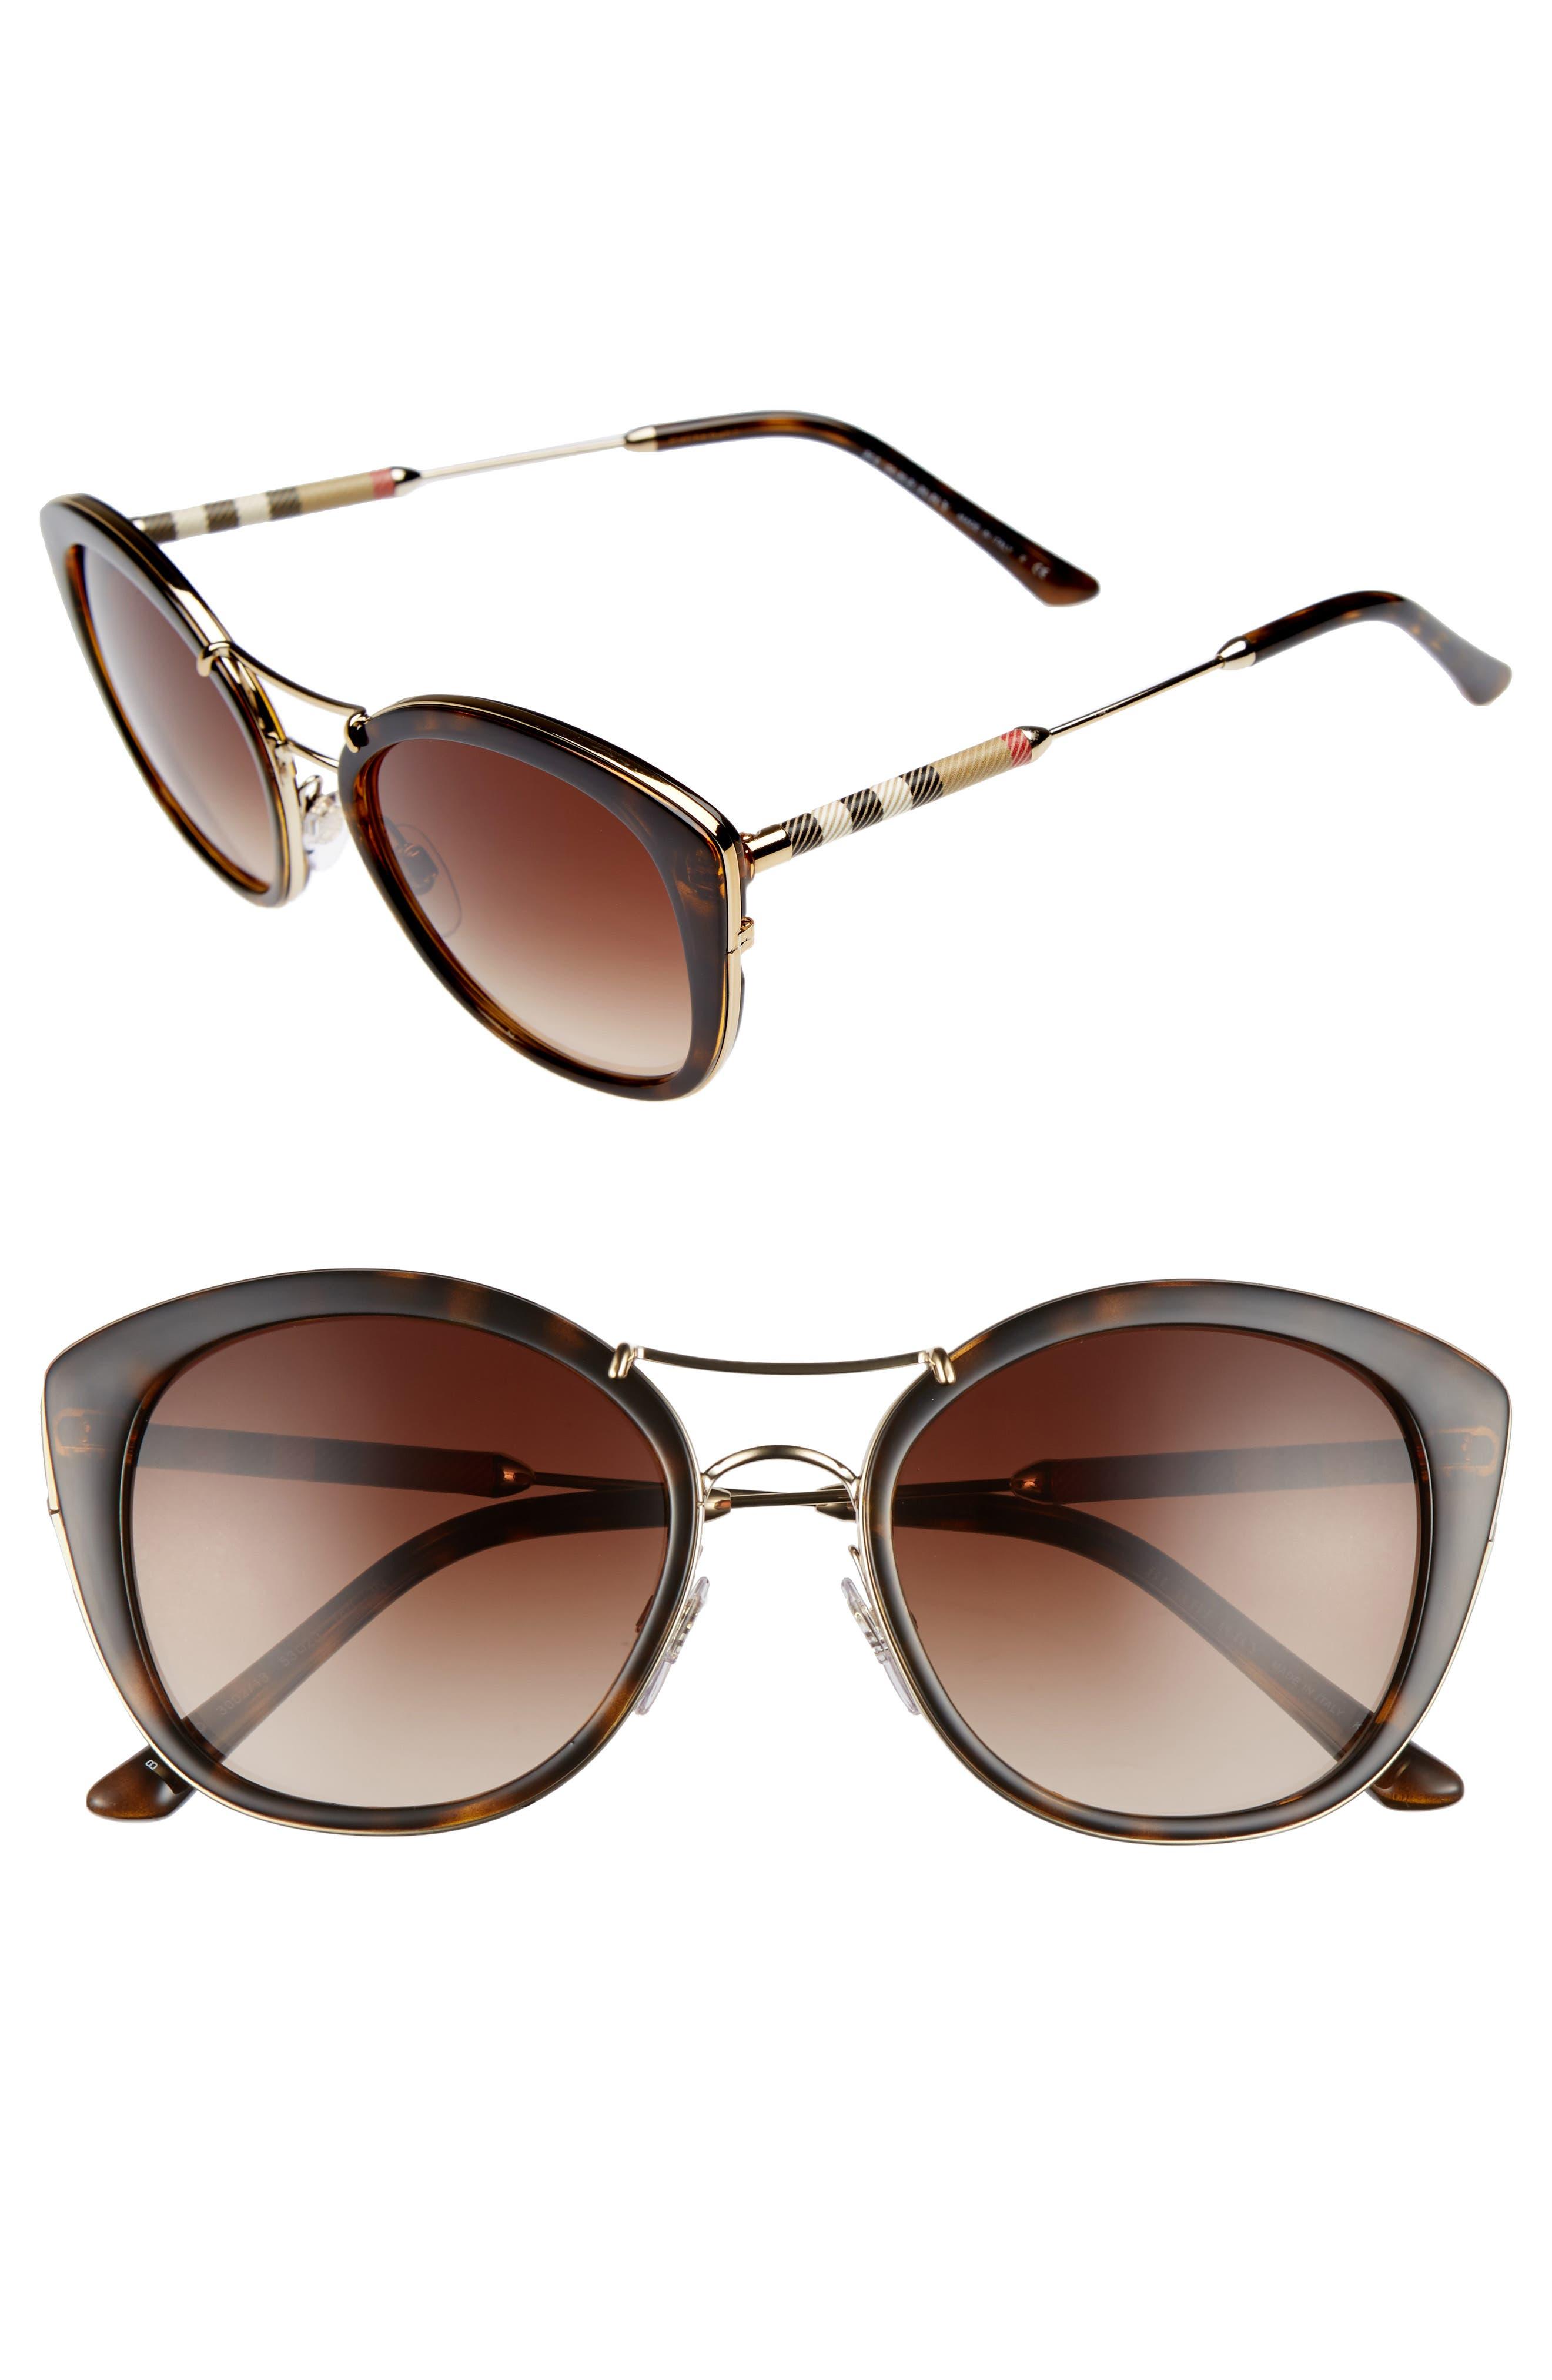 Burberry 53mm Gradient Sunglasses